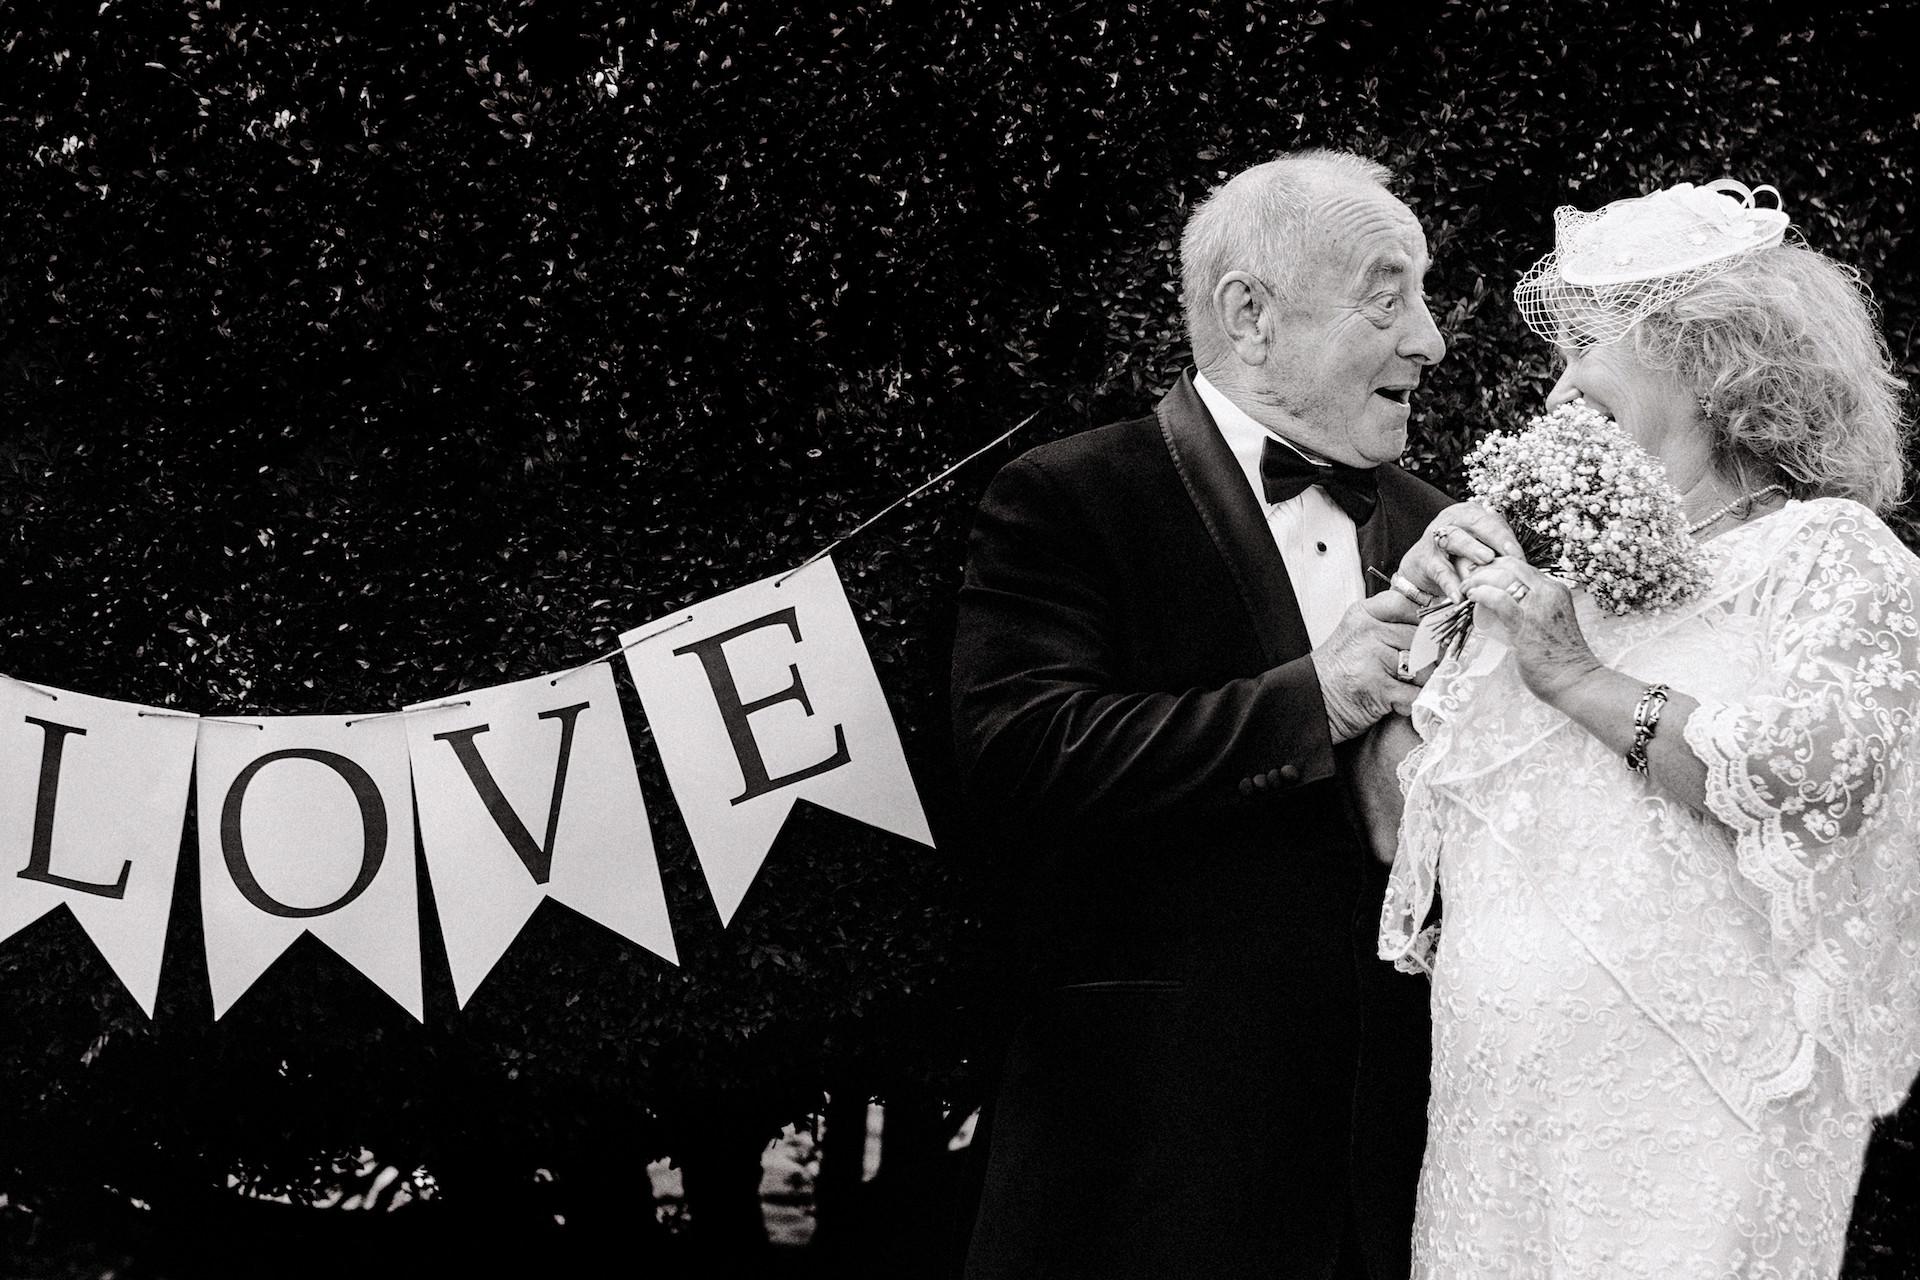 Ehepaar feiert Hochzeitsjubiläum